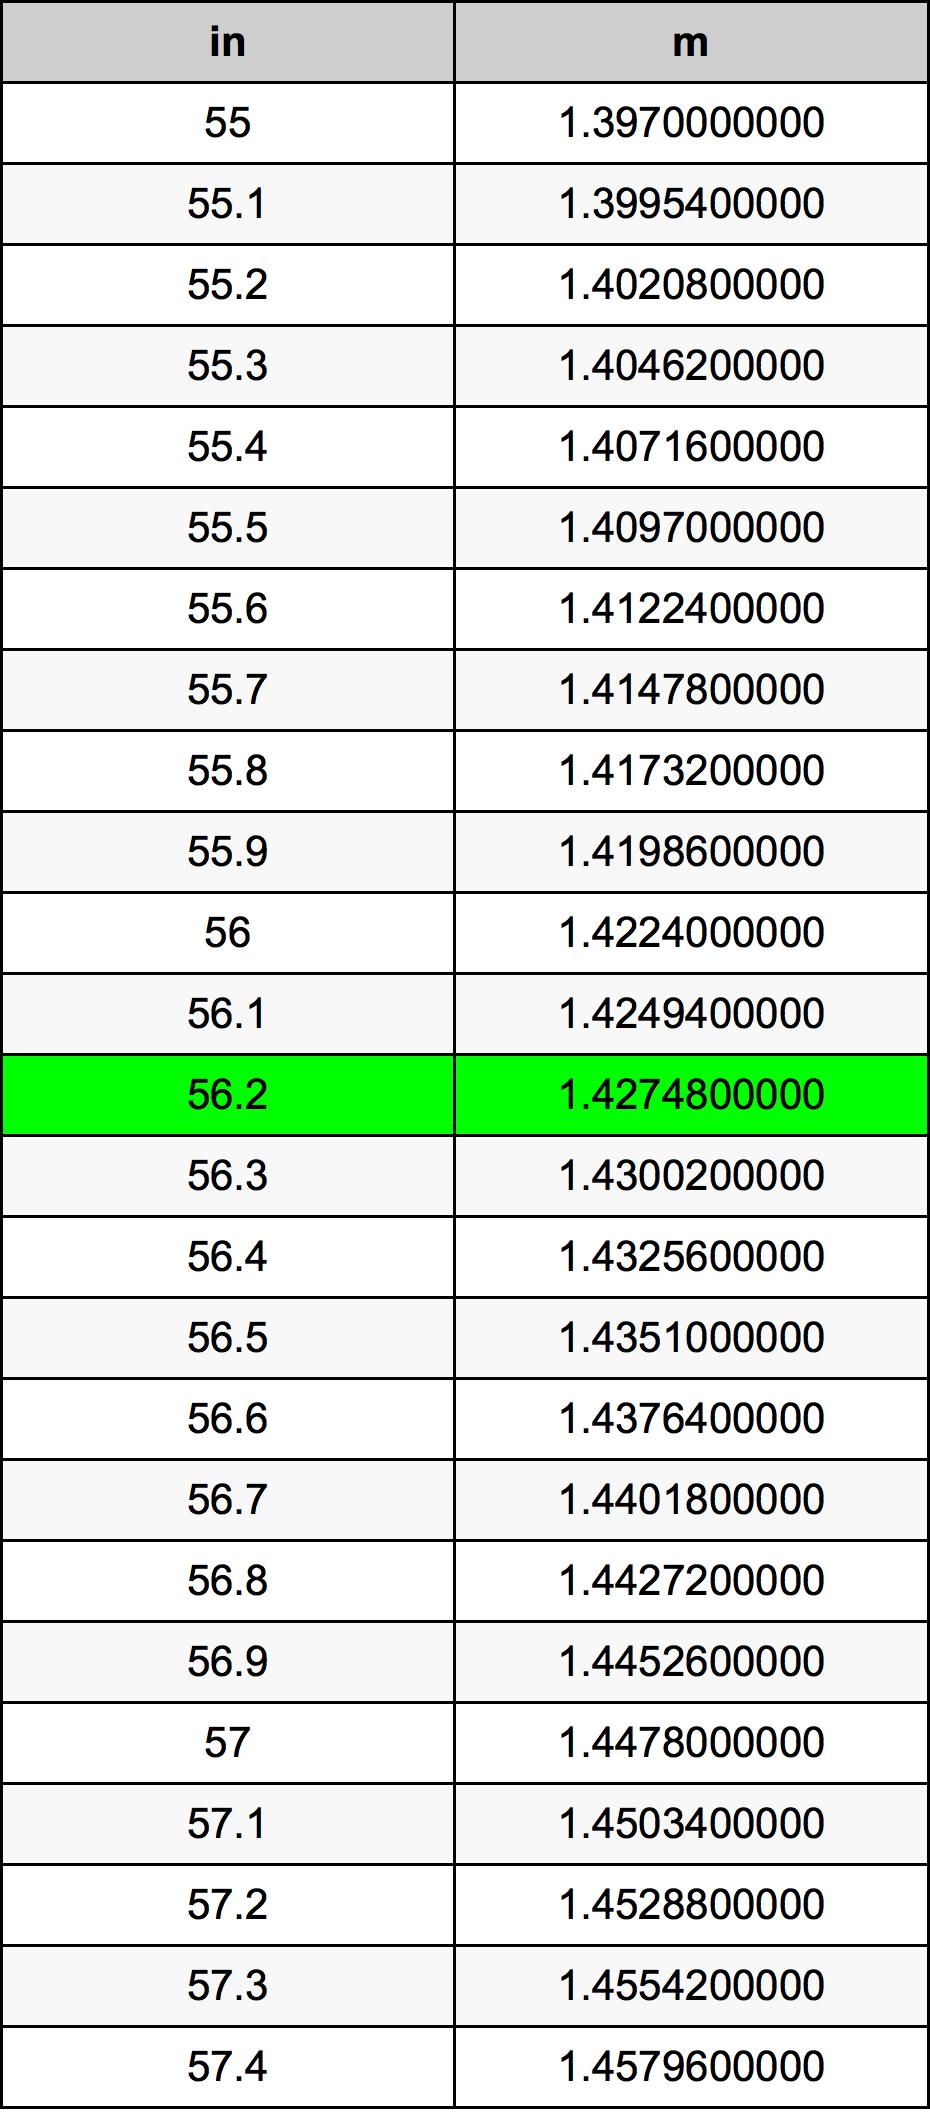 56.2 дюйм Таблица преобразования